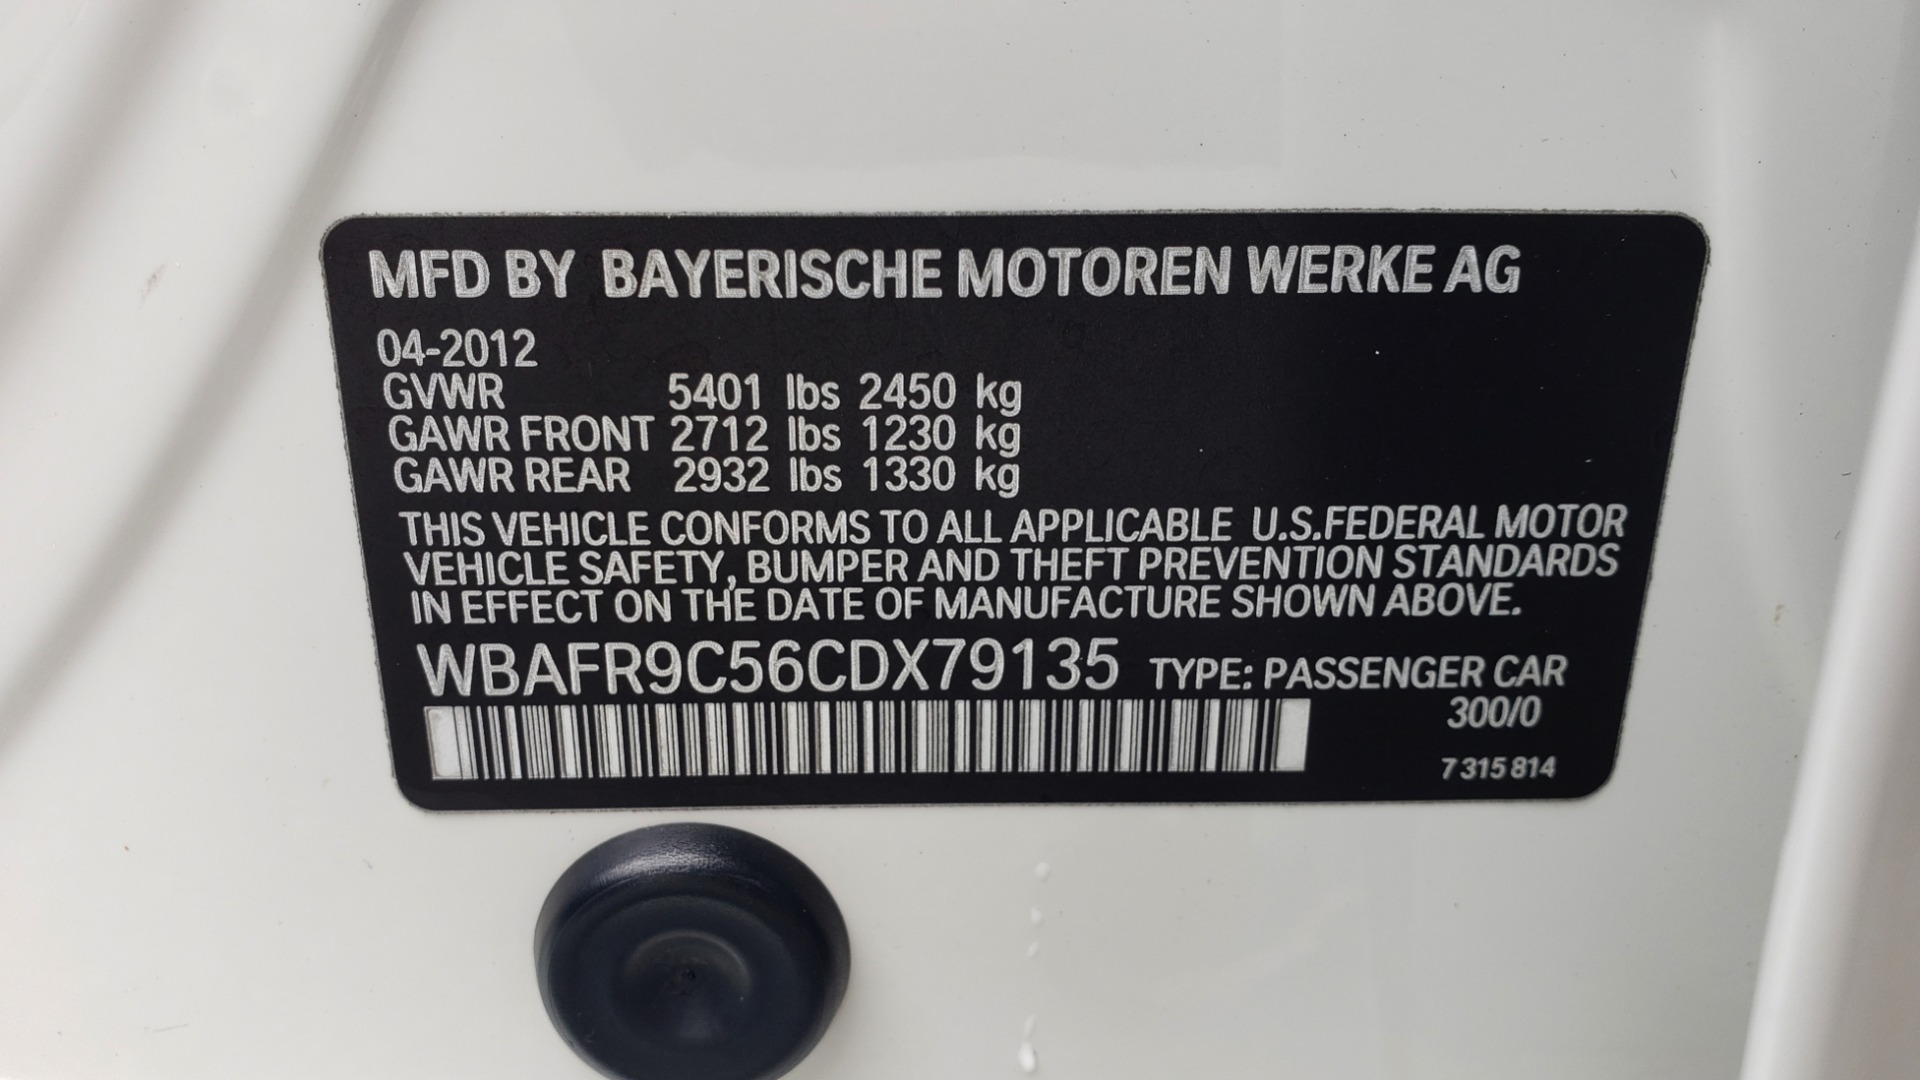 Used 2012 BMW 5 SERIES 550I M SPORT / NAV / CONV PKG / SUNROOF / PREM SND / REARVIEW for sale Sold at Formula Imports in Charlotte NC 28227 79